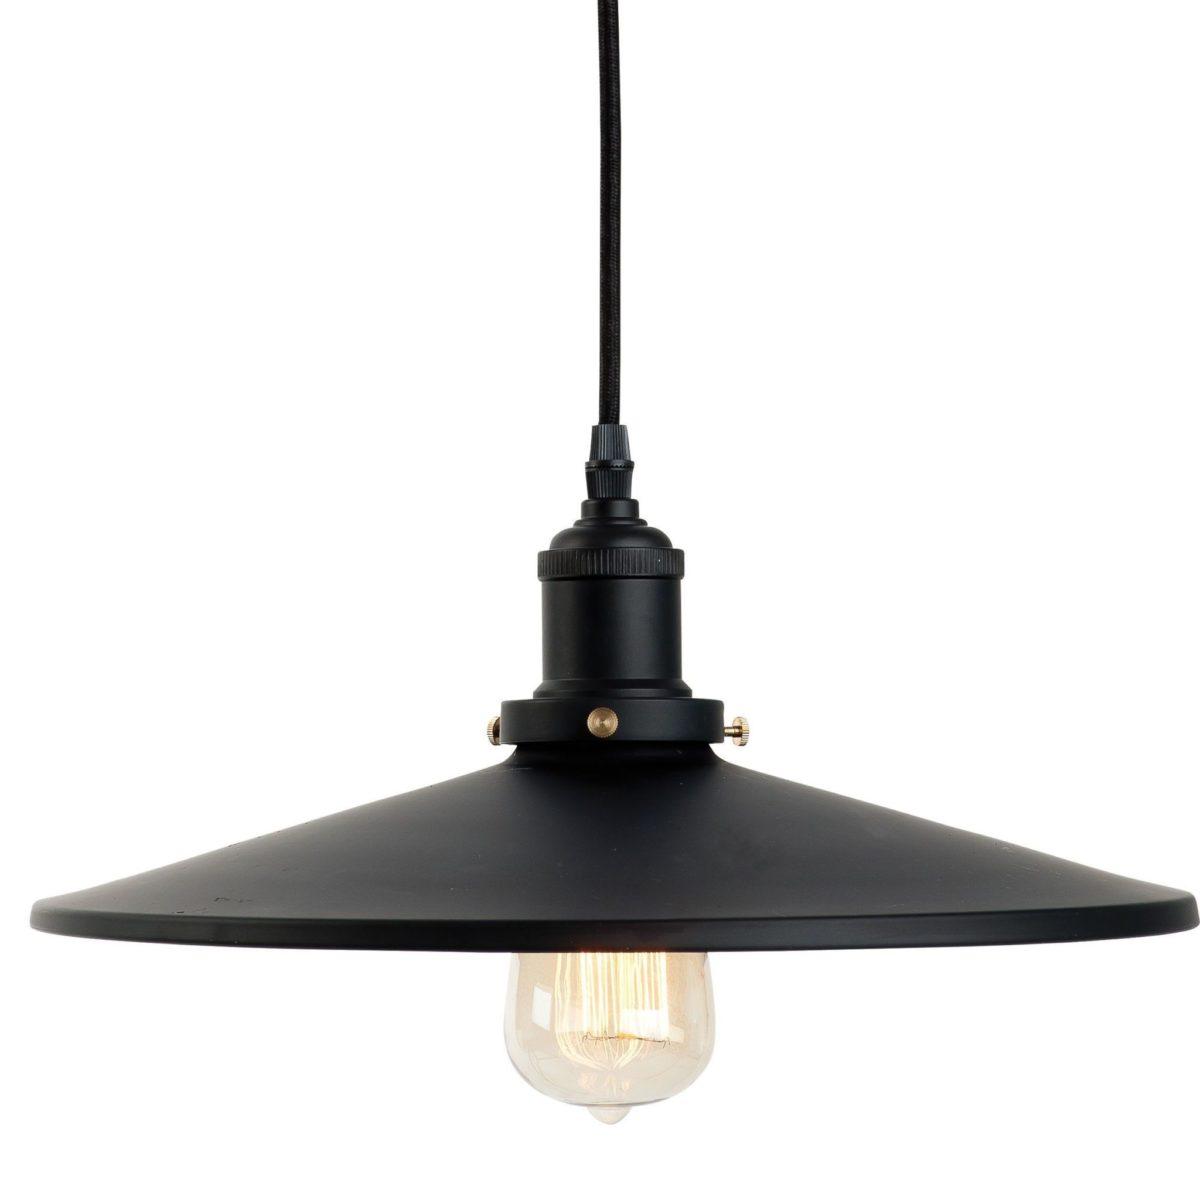 Its zagreb hb hanglamp 2500x2500